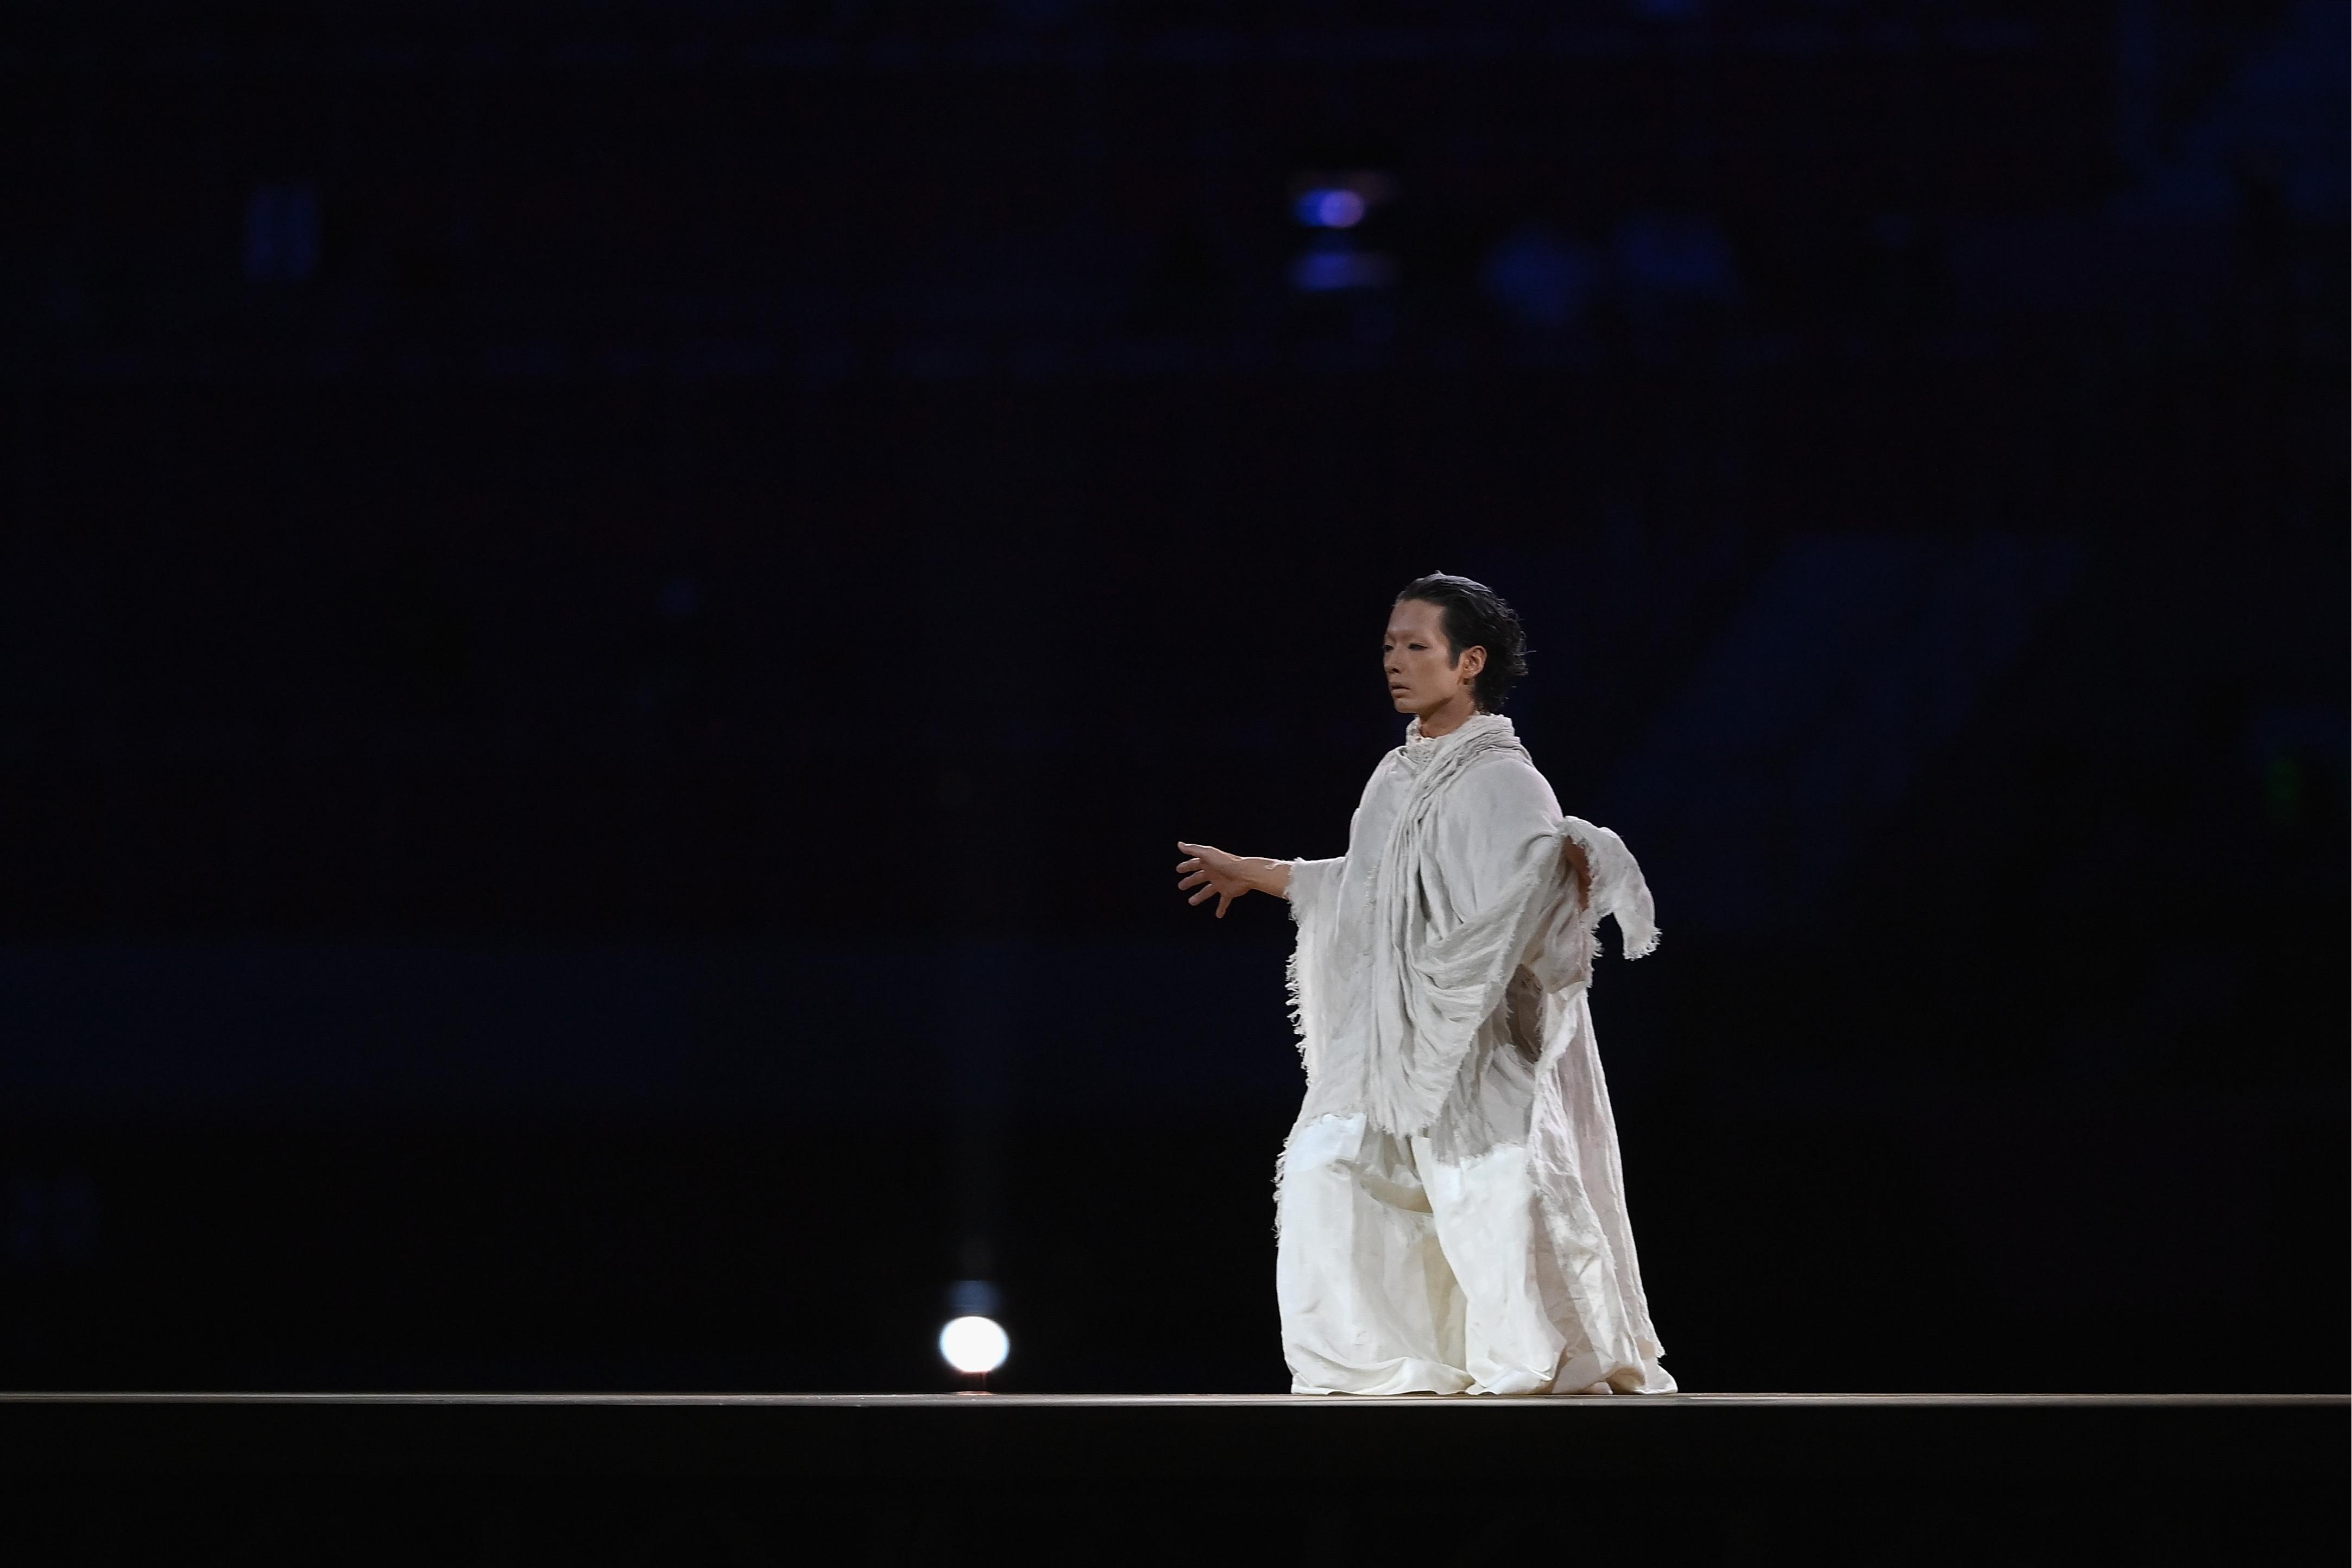 Фото: Танец ухода из жизни (Photo by Matthias Hangst/Getty Images)